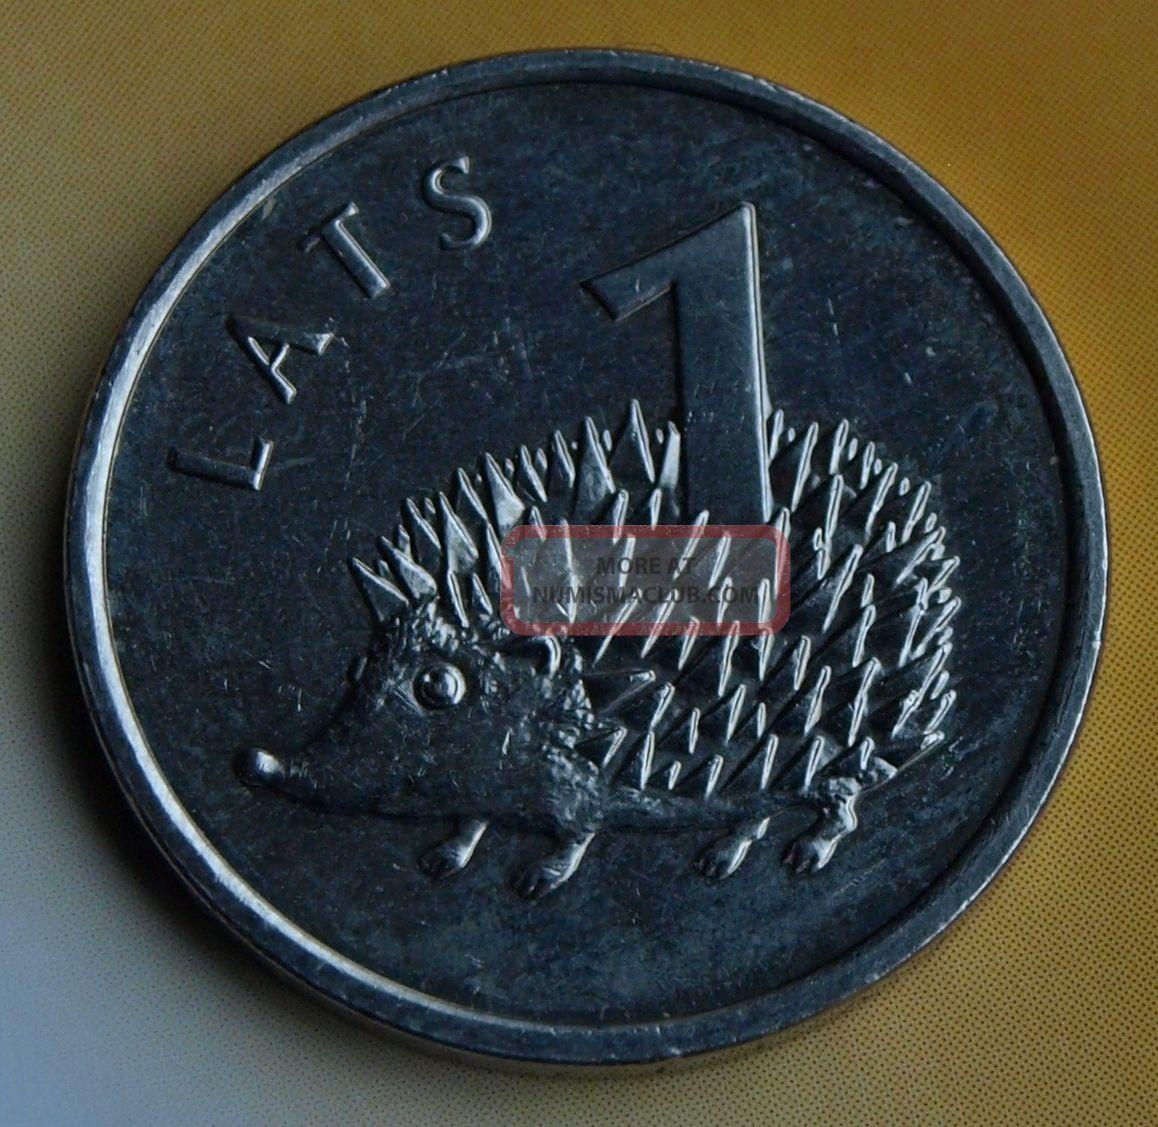 Latvia 1 Lats Coin Hedgehog,  2012,  Lettland Europe photo